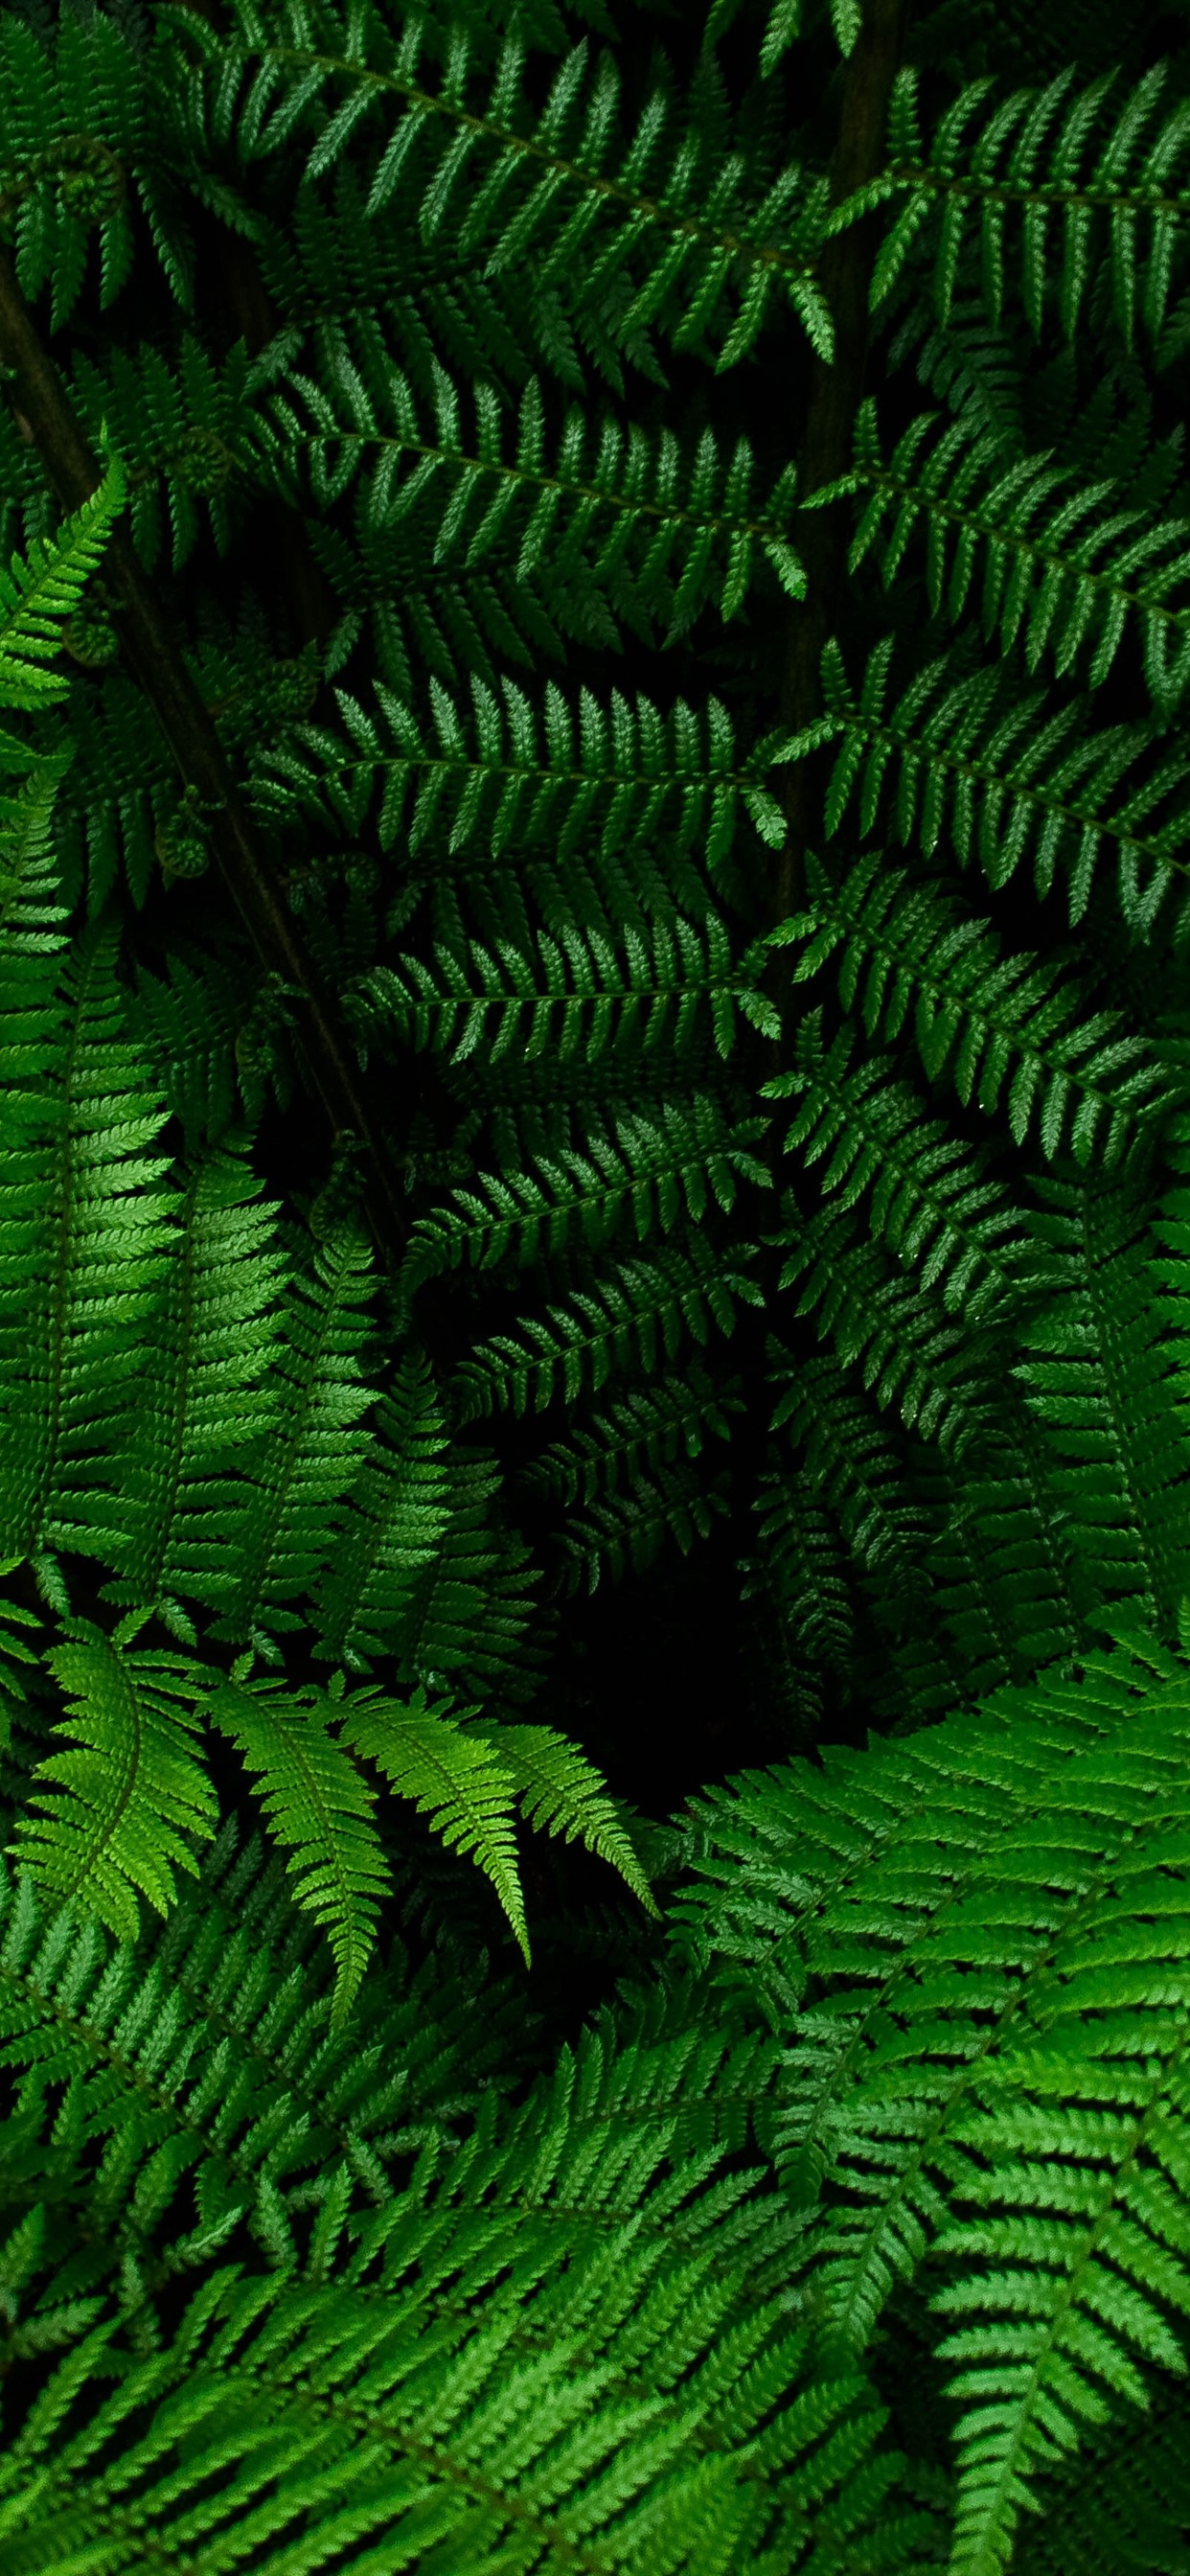 Fern Green Leaves Plants 1242x2688 Iphone Xs Max Wallpaper